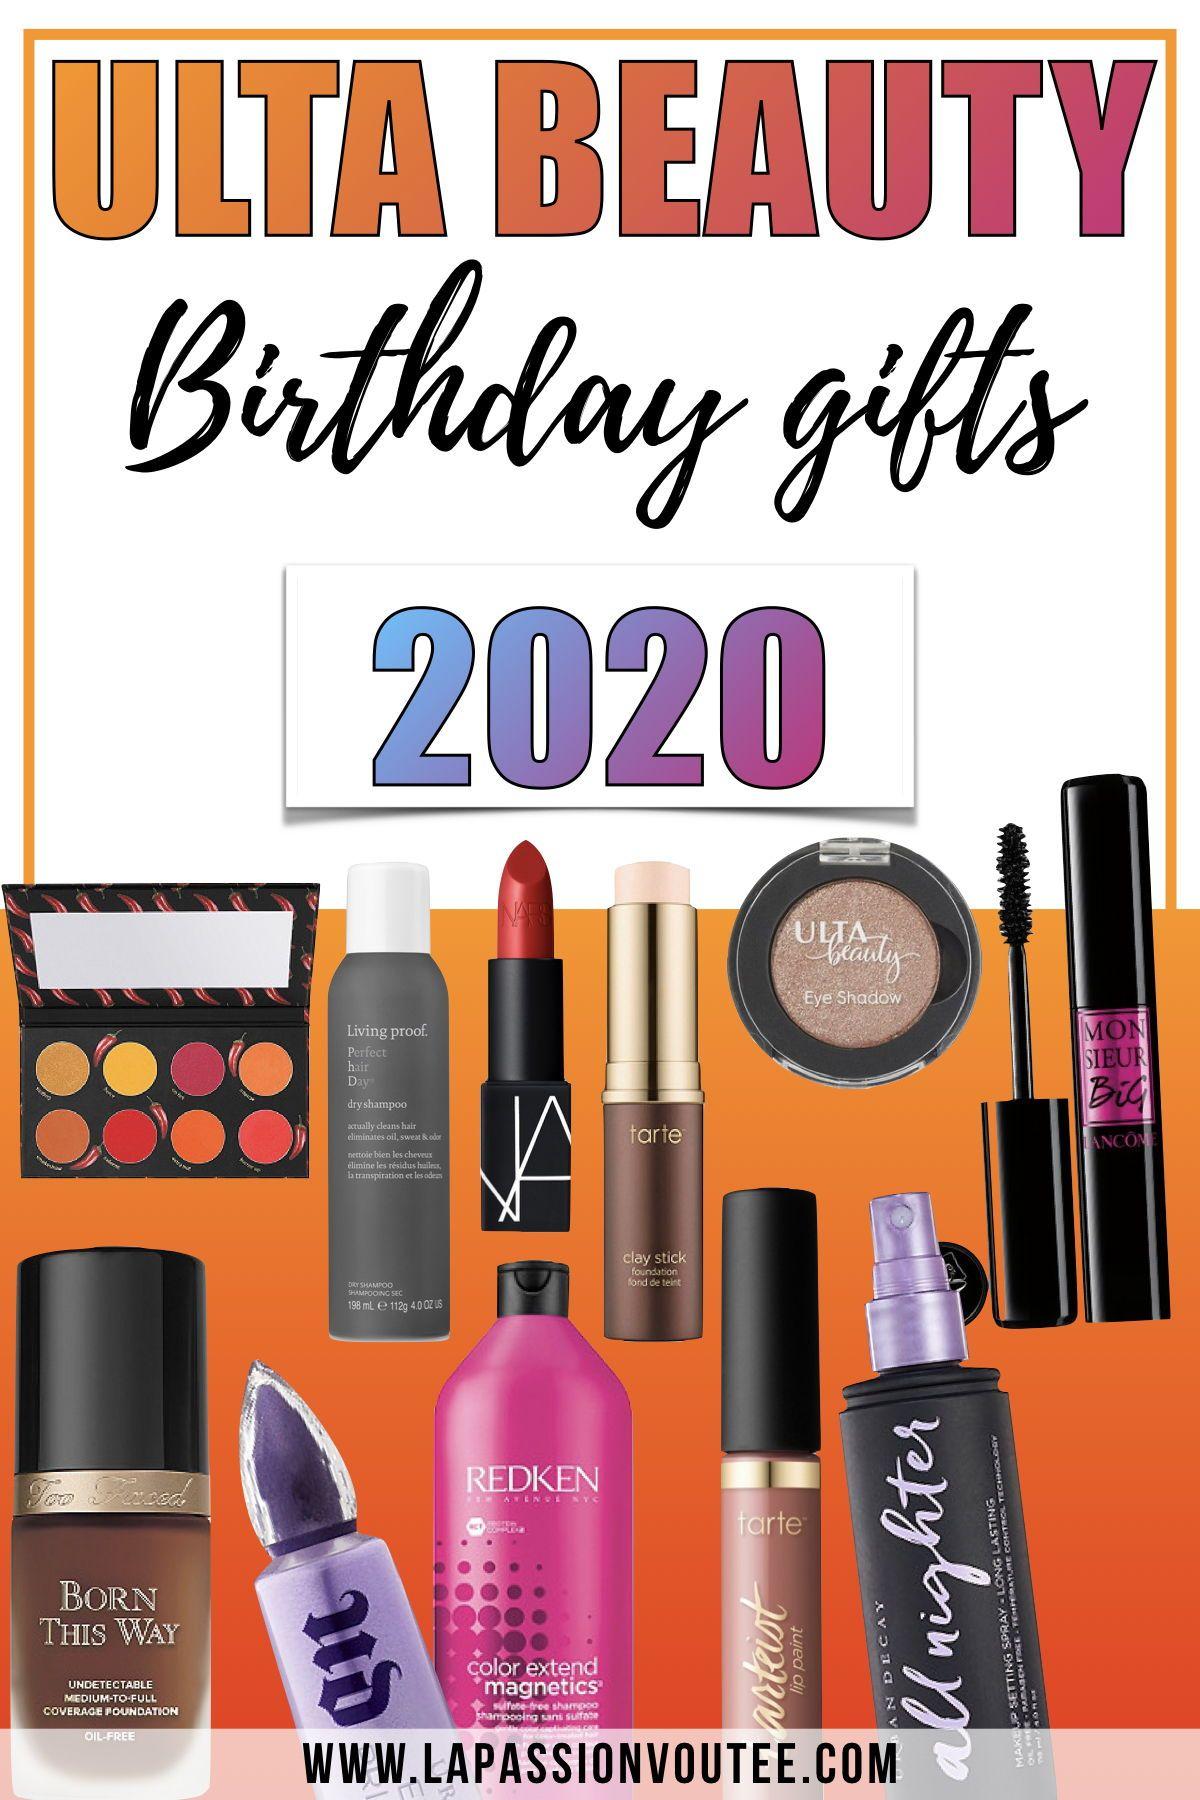 Best FREE Ulta Birthday Gift 2020 March Bliss Micro Magic